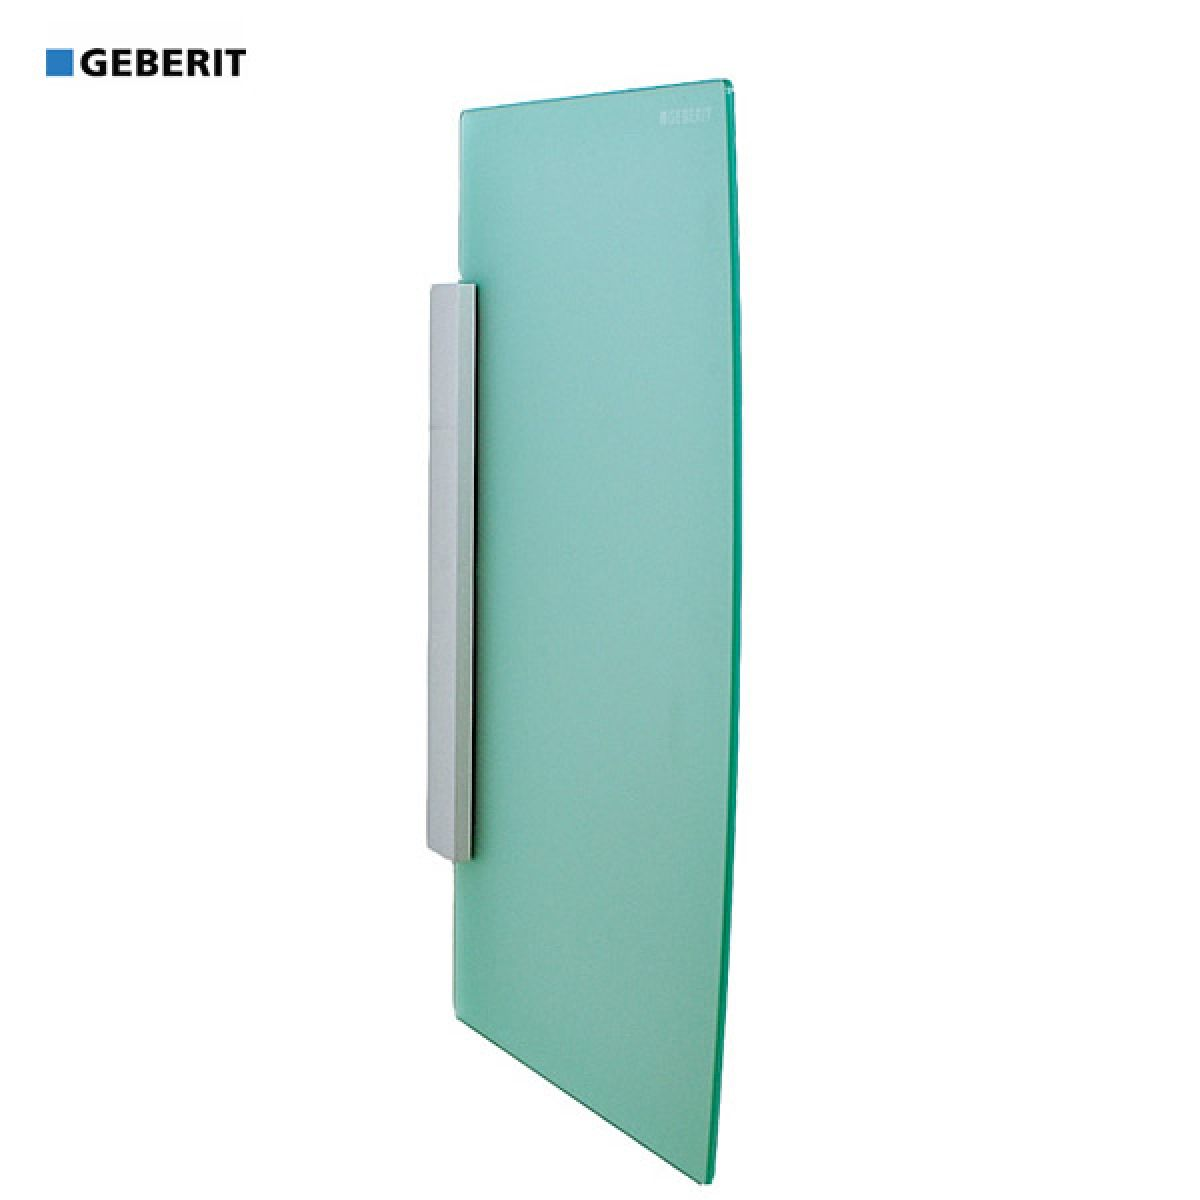 Geberit duofix urinal division uk bathrooms for Geberit us